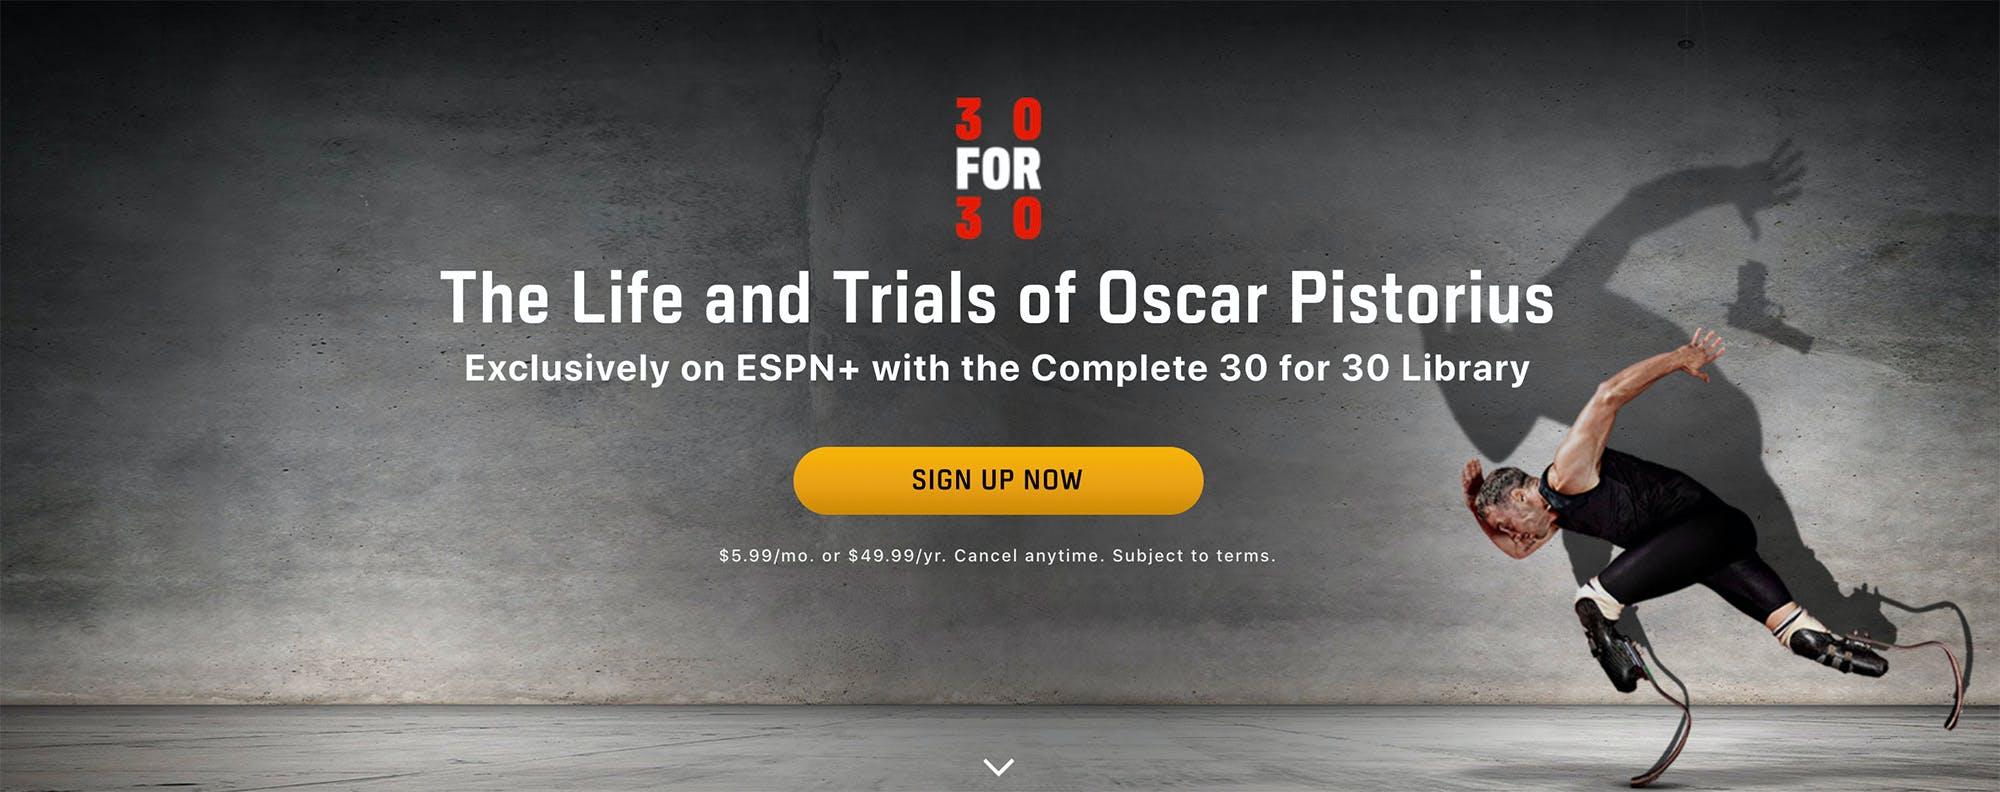 stream oscar pistorius documentary